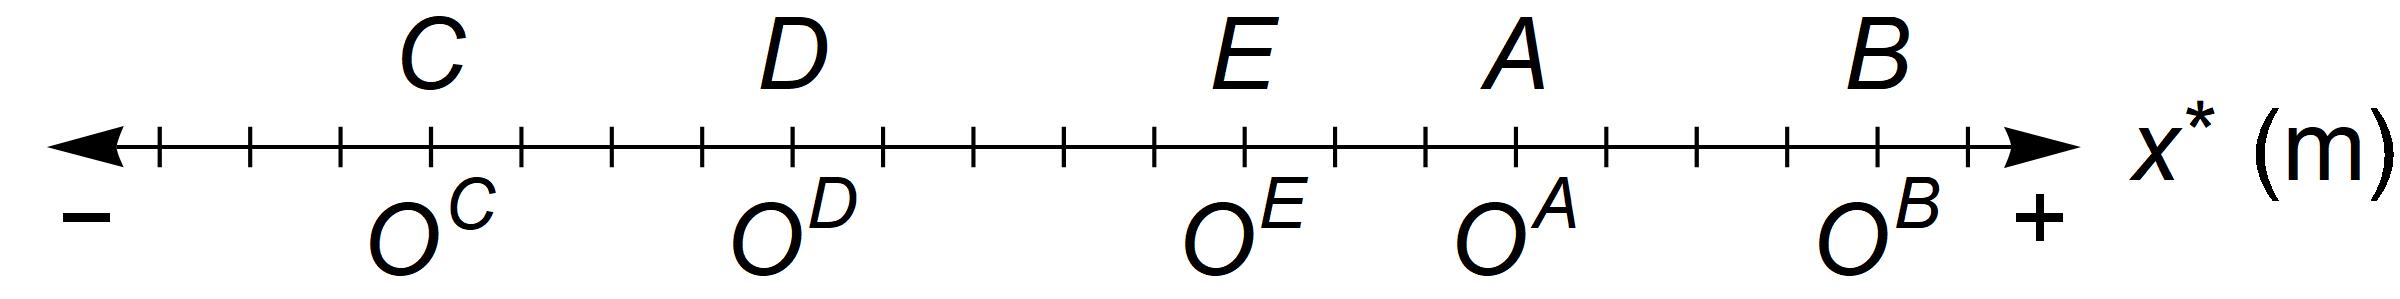 The * in \(x^*\) stands for \(A\), \(B\), \(C\), \(D\), or \(E\), depending on whether \(O^A\), \(O^B\), \(O^C\), \(O^D\), or \(O^E\) is being used as the axis origin.